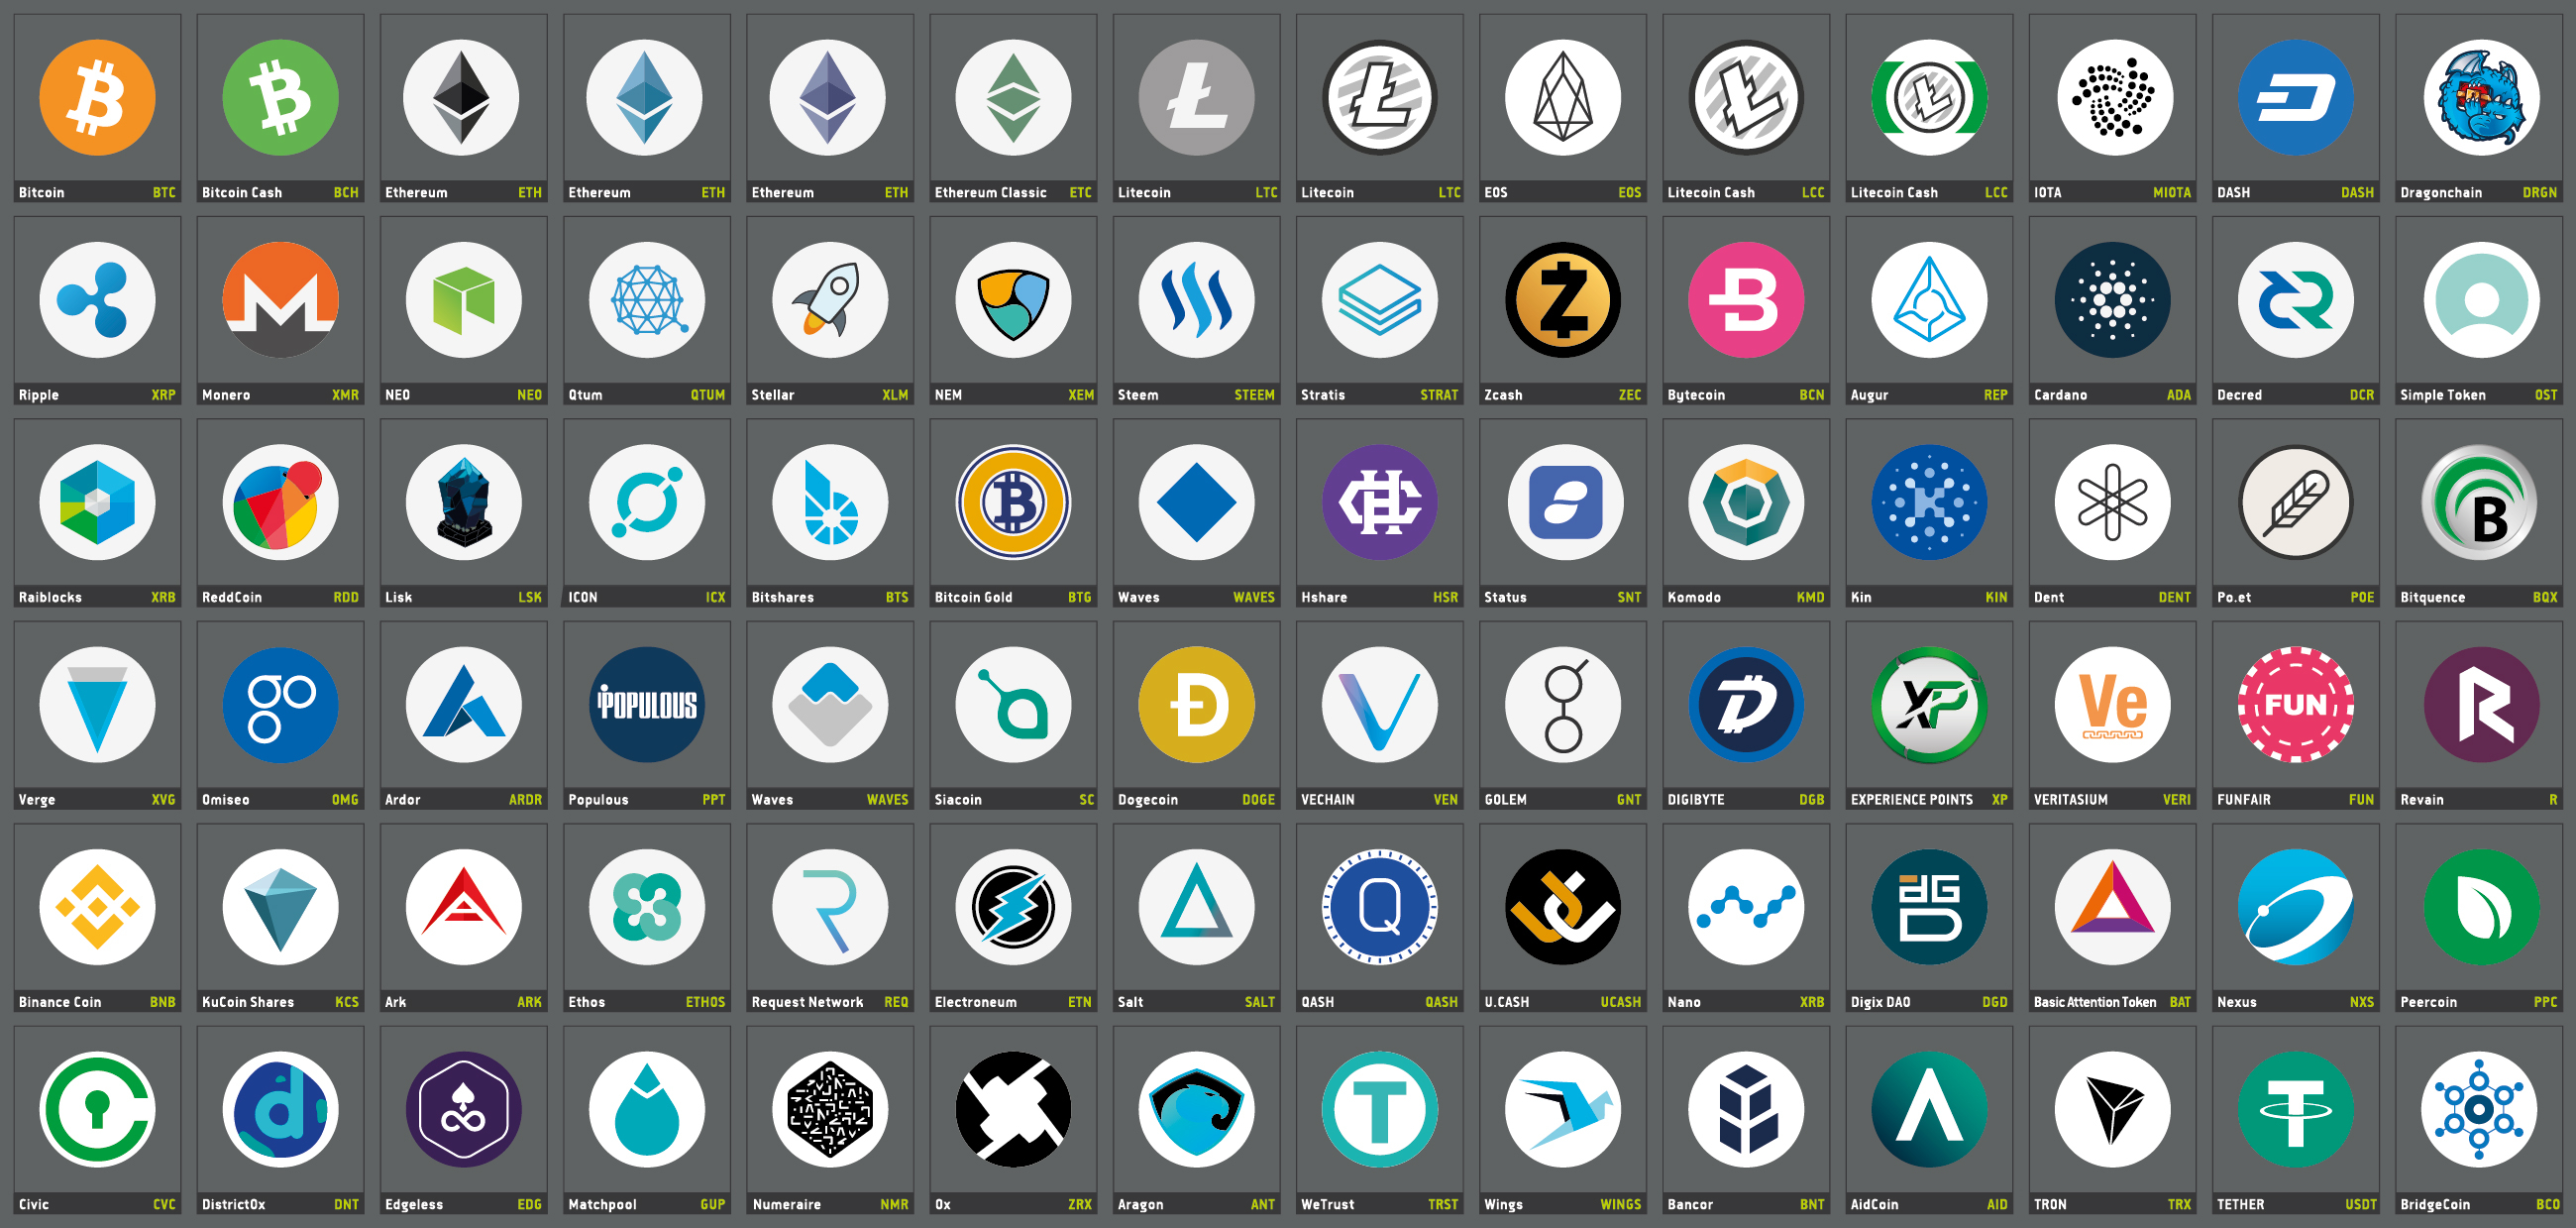 Liste aller Kryptowährungen